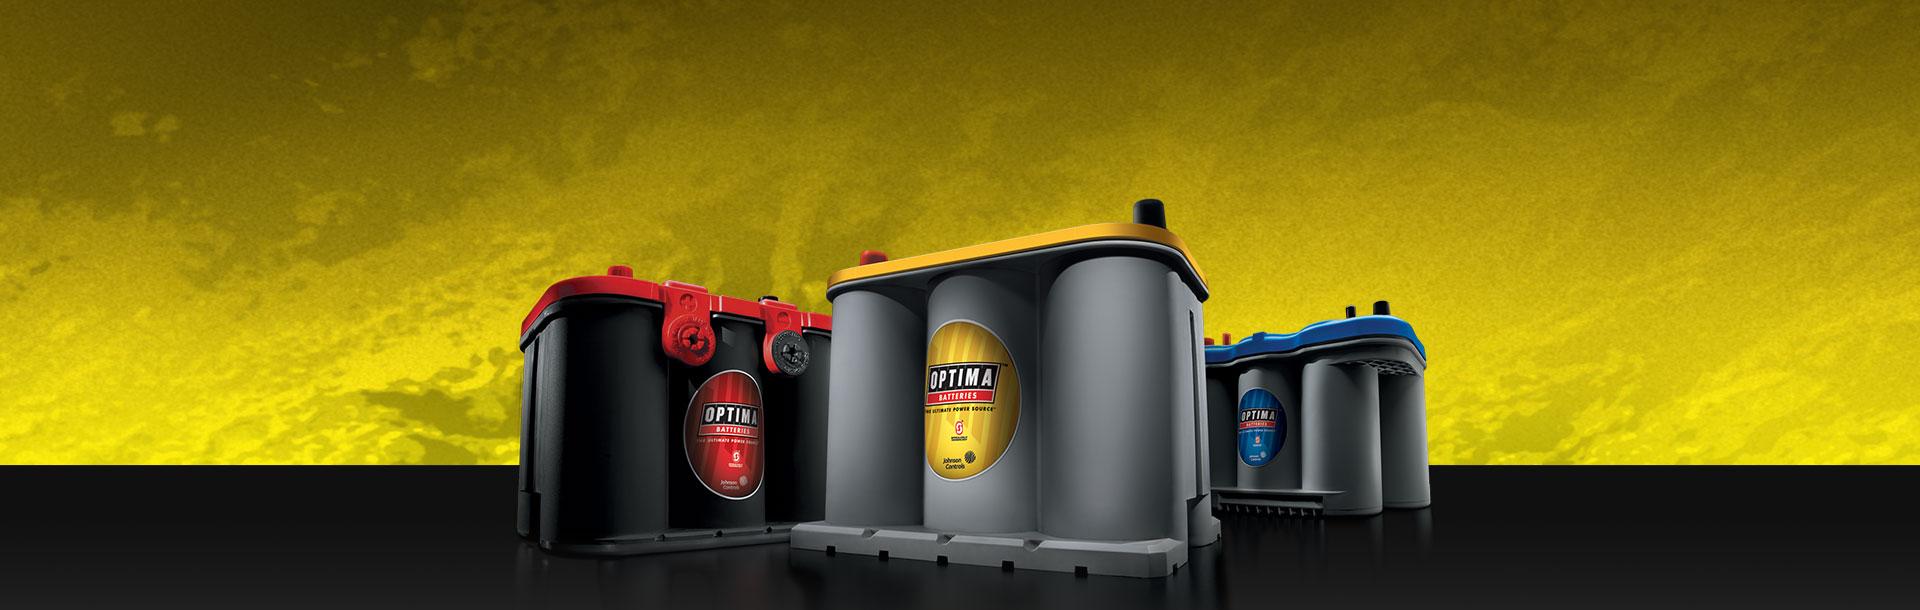 Baterías para autos rojas, amarillas, azules y baterías para barco